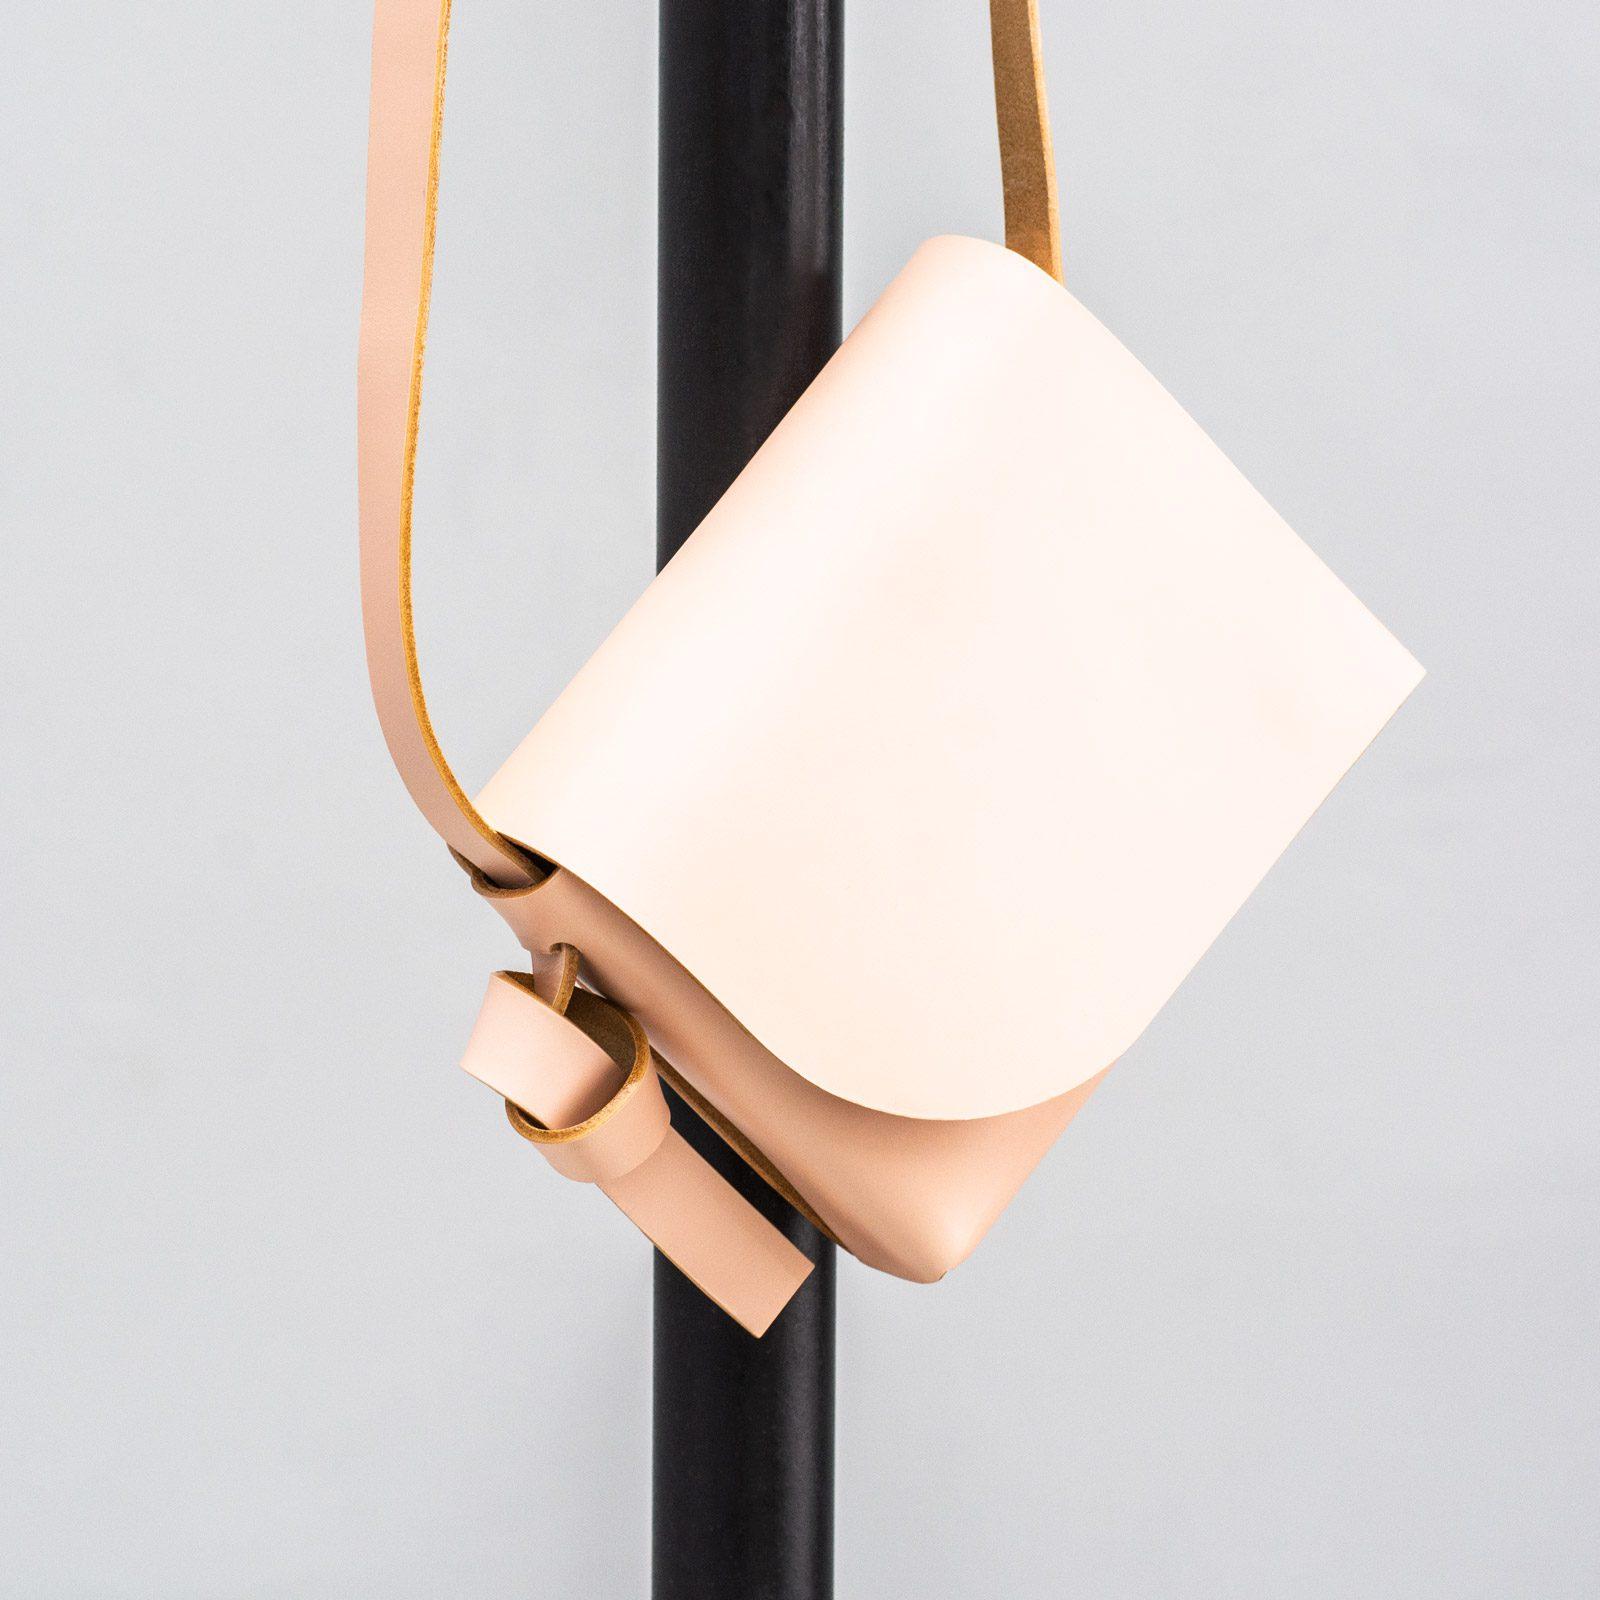 Powder leather bag handmade by PBG